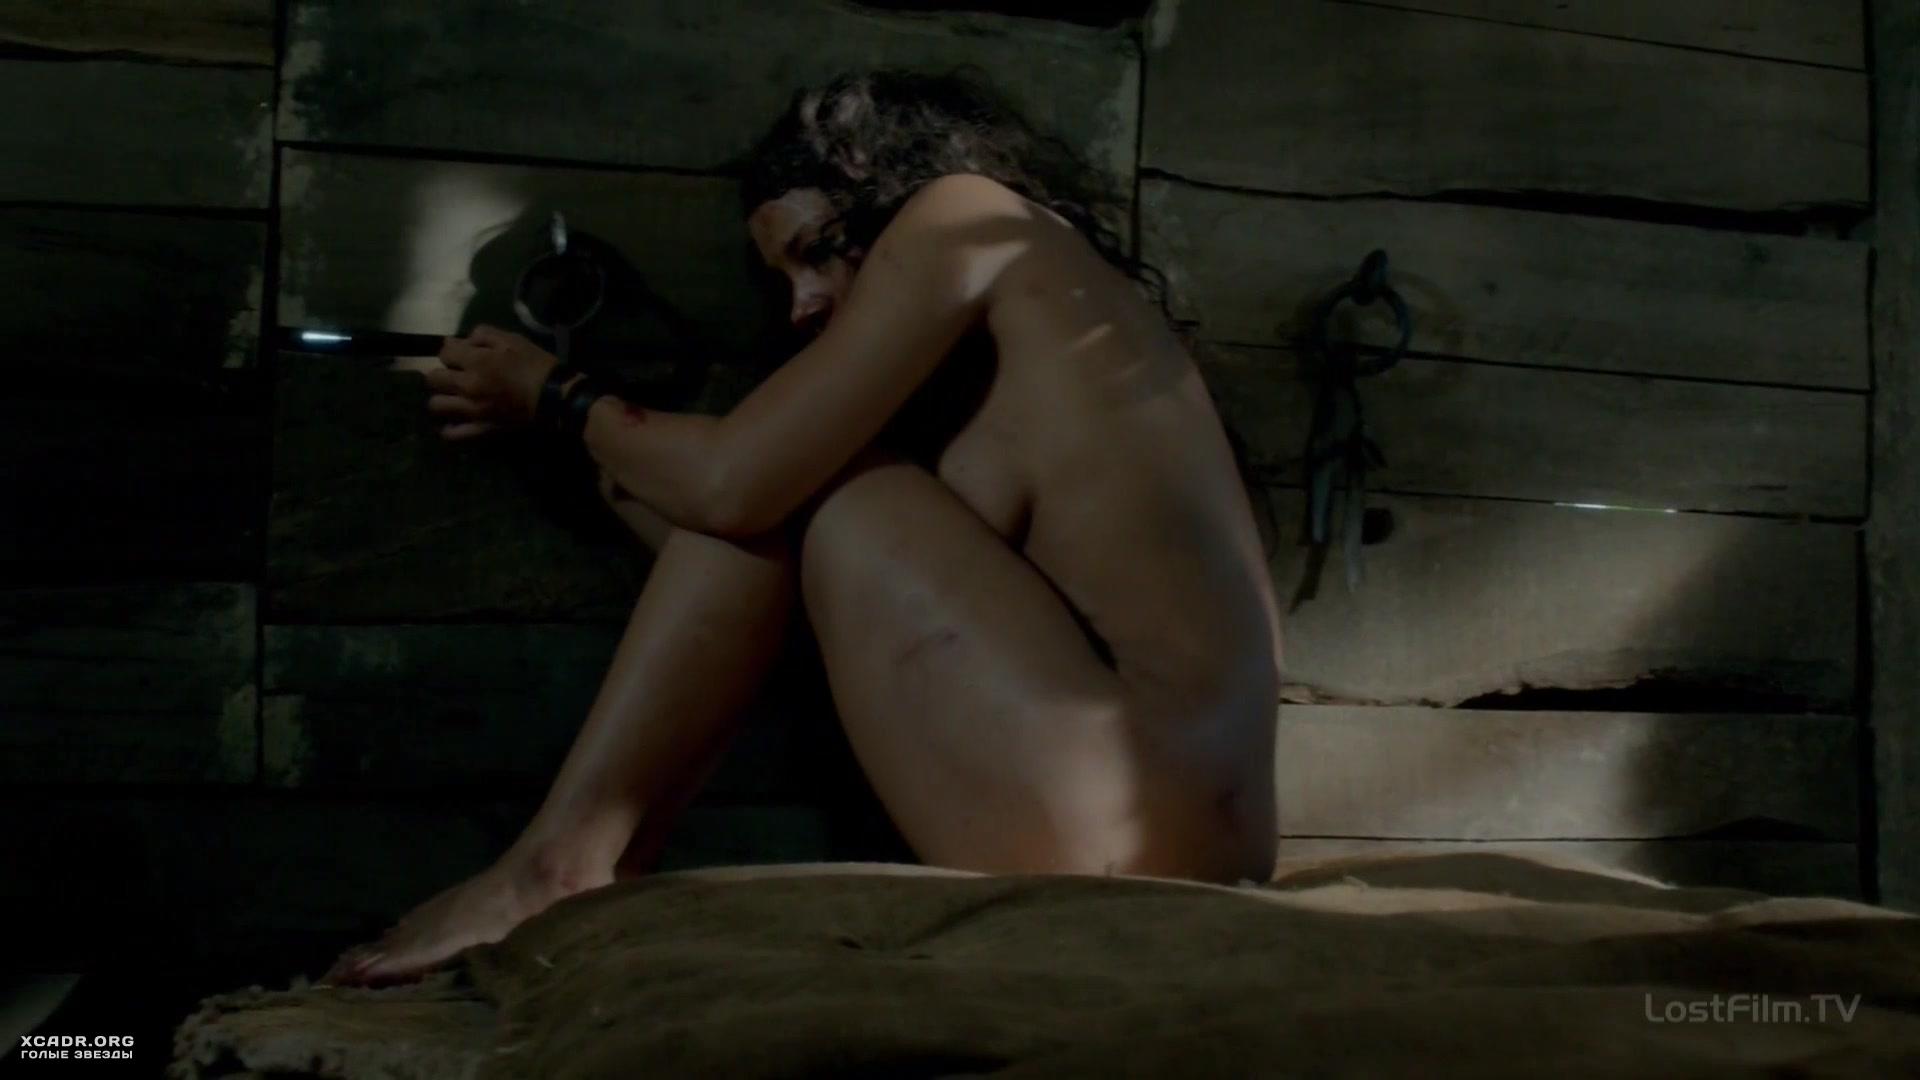 Gaping anal creampie porn